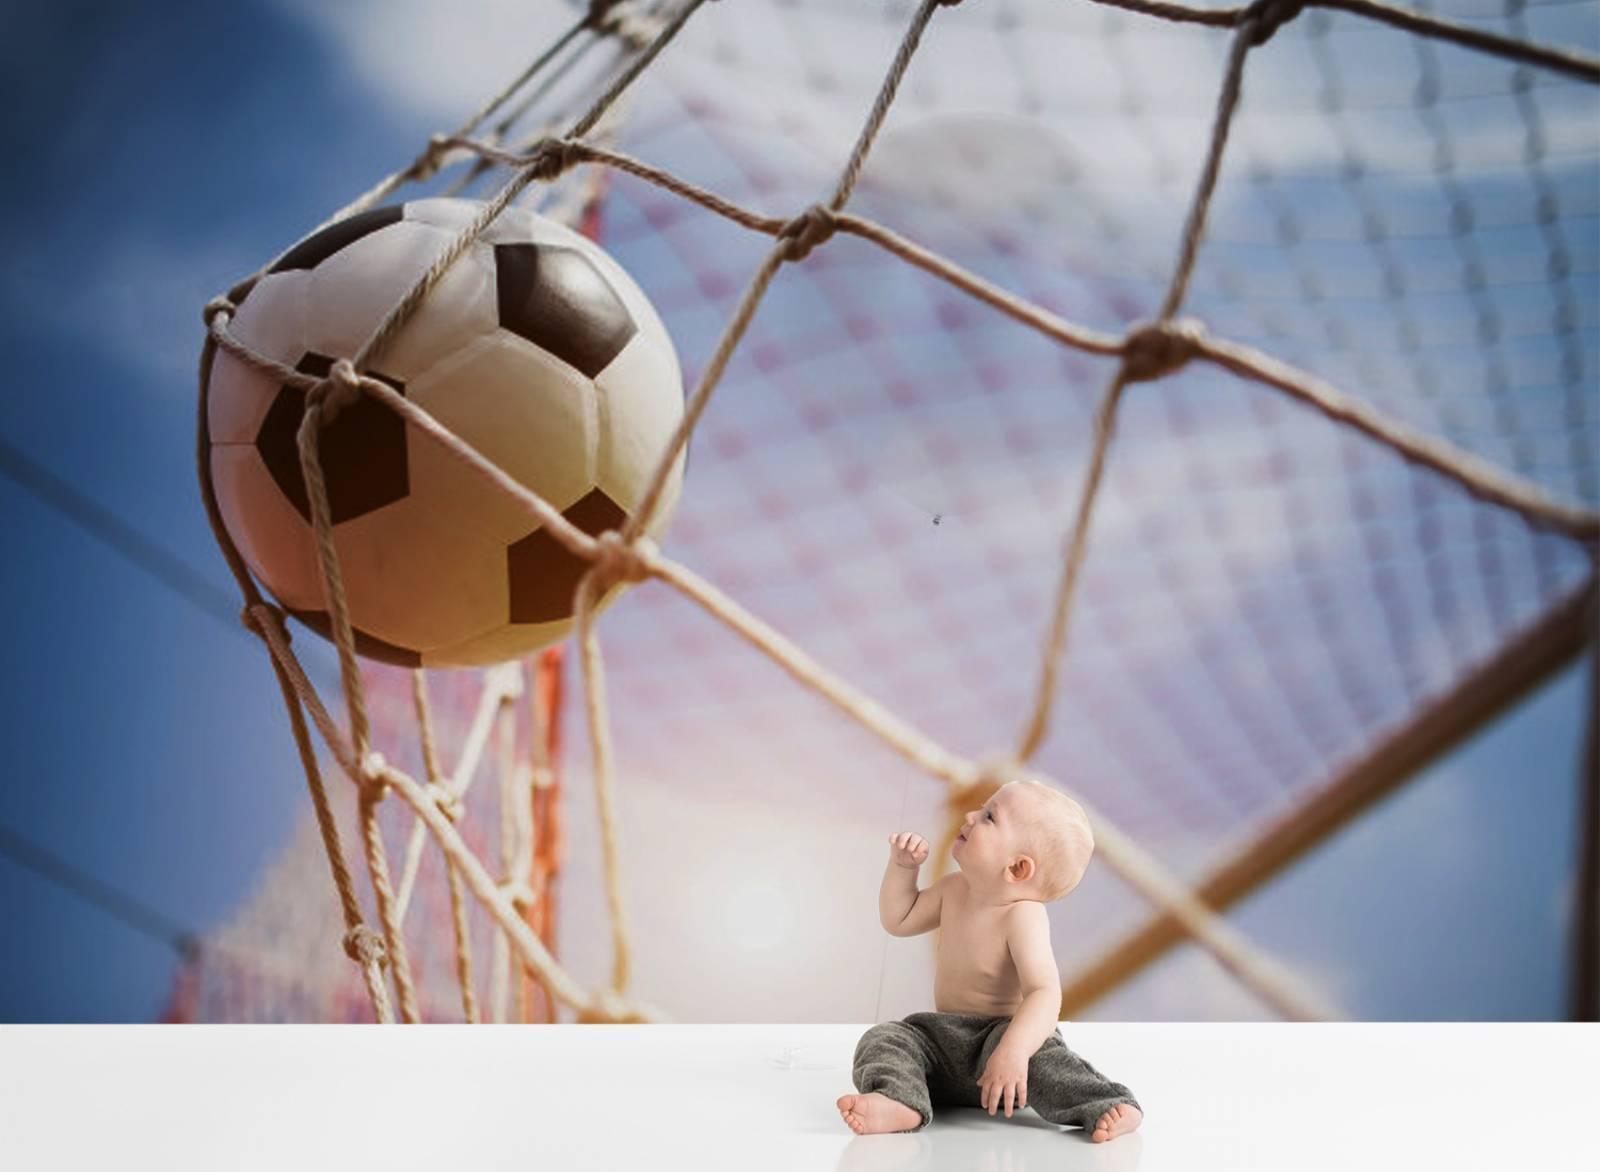 Papel de Parede Bola na Rede| Painel Fotográfico M² imagem 1